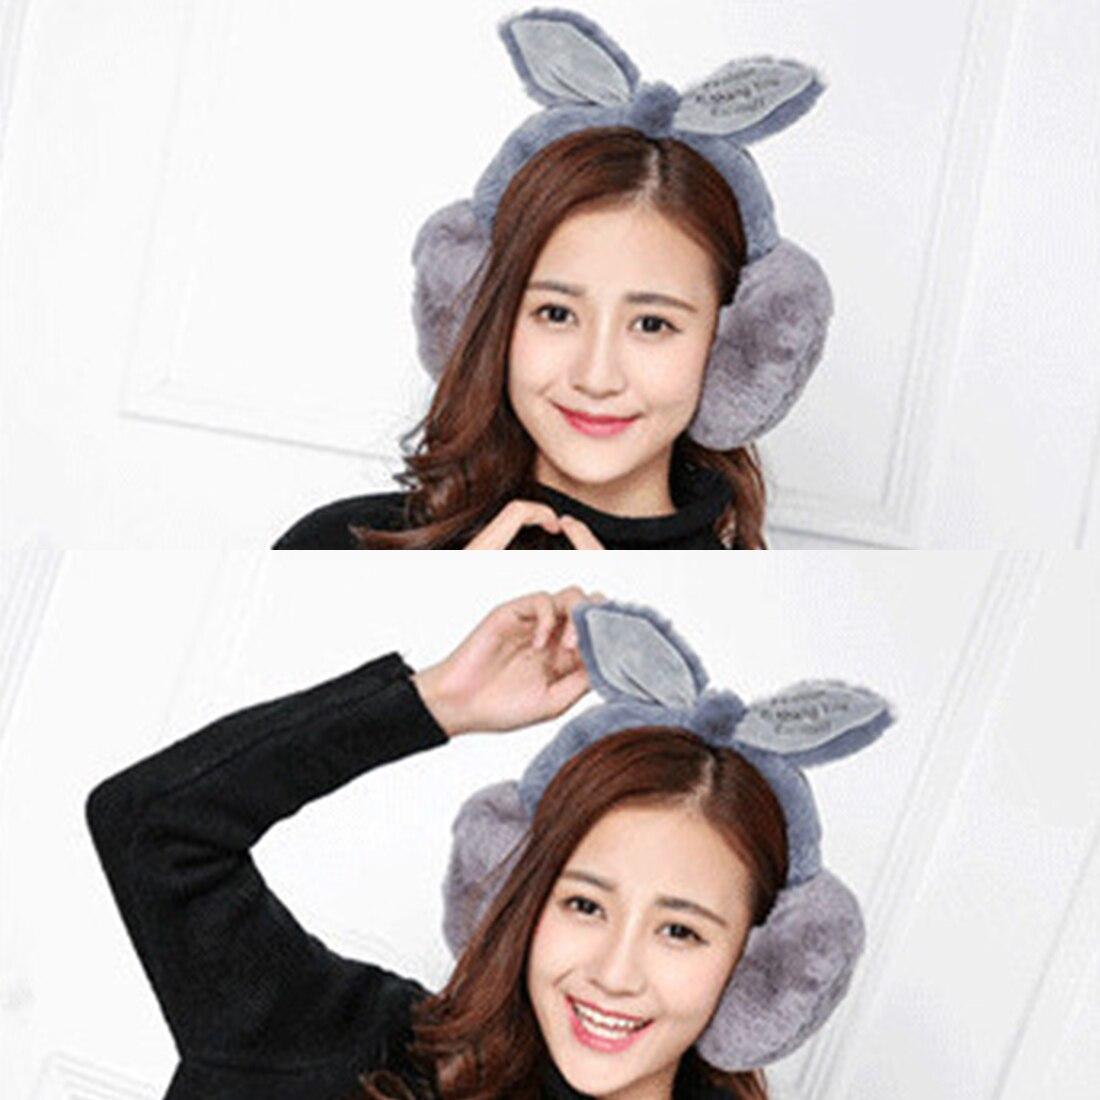 Charming Elegant Rabbit Fur Winter Earmuffs For Women Warm Earmuffs Ear Warmers Gifts For Girls Cover Ears